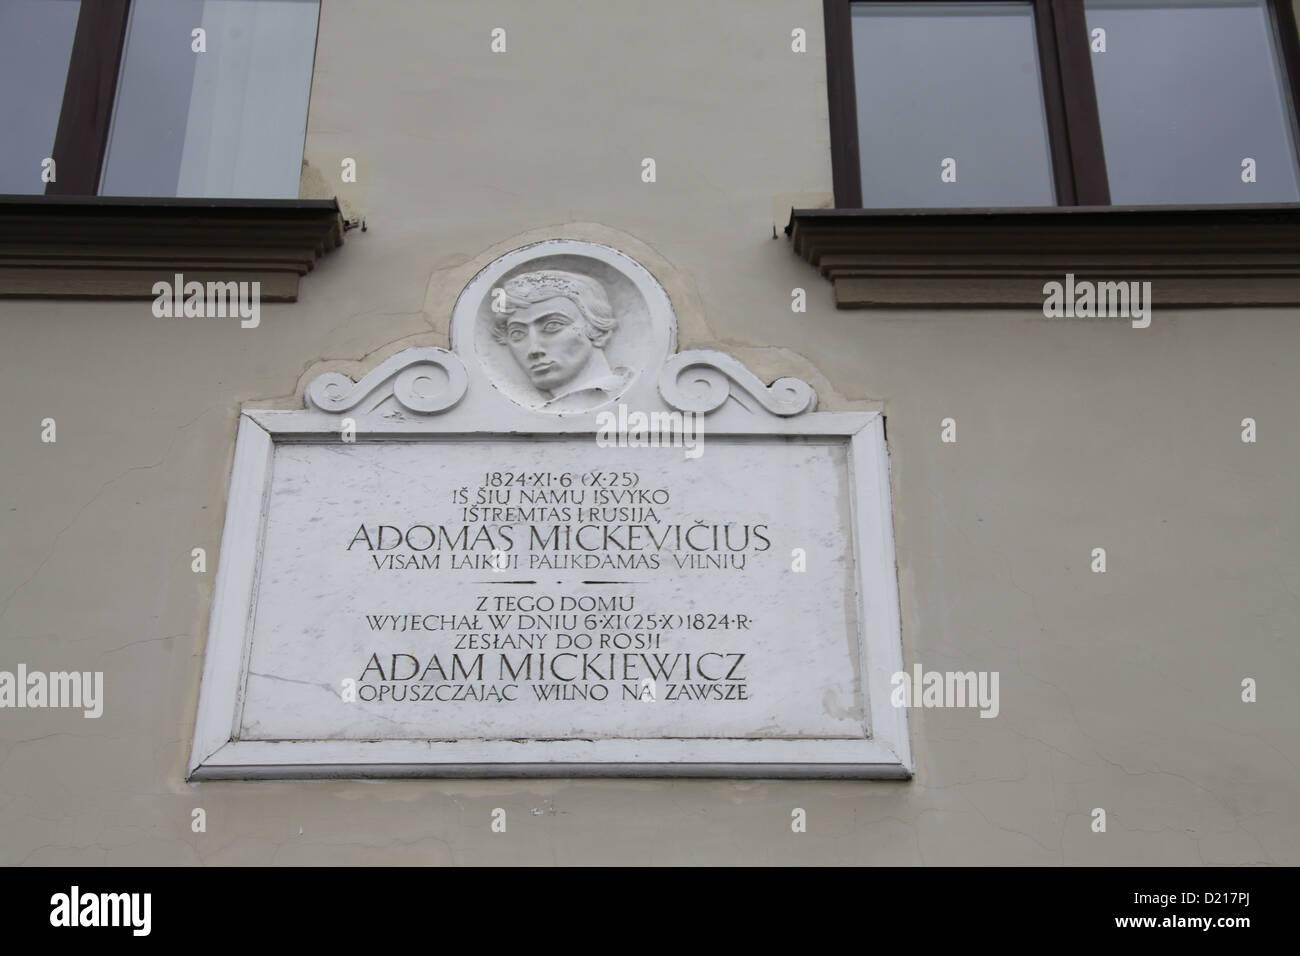 Commemorative Plaque in Vilnius Stock Photo